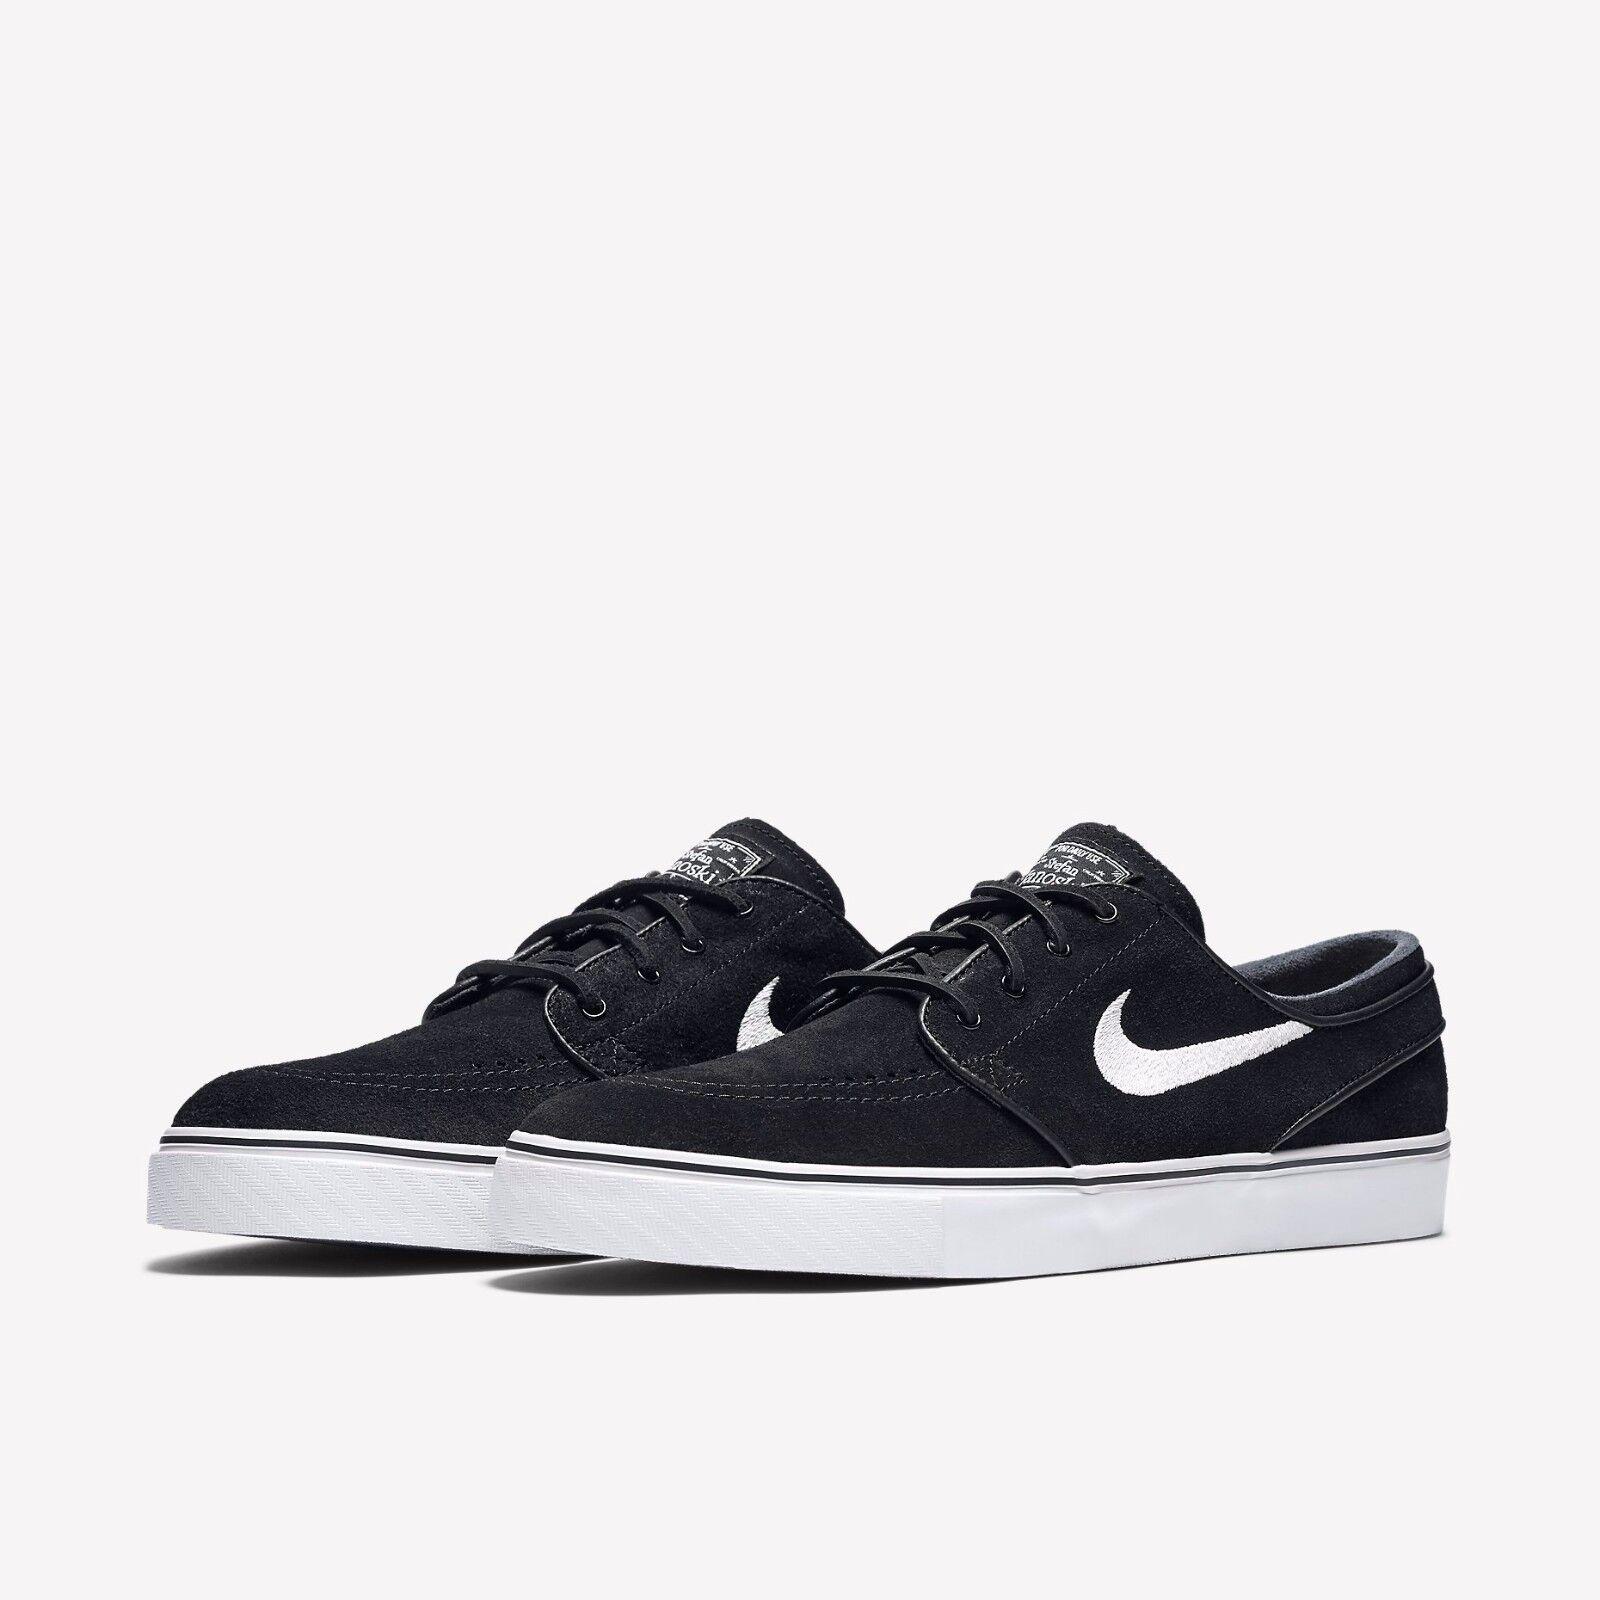 Nike SB Zoom Stefan Janoski Hommes Suede Noir blanc  Chaussures Brand New